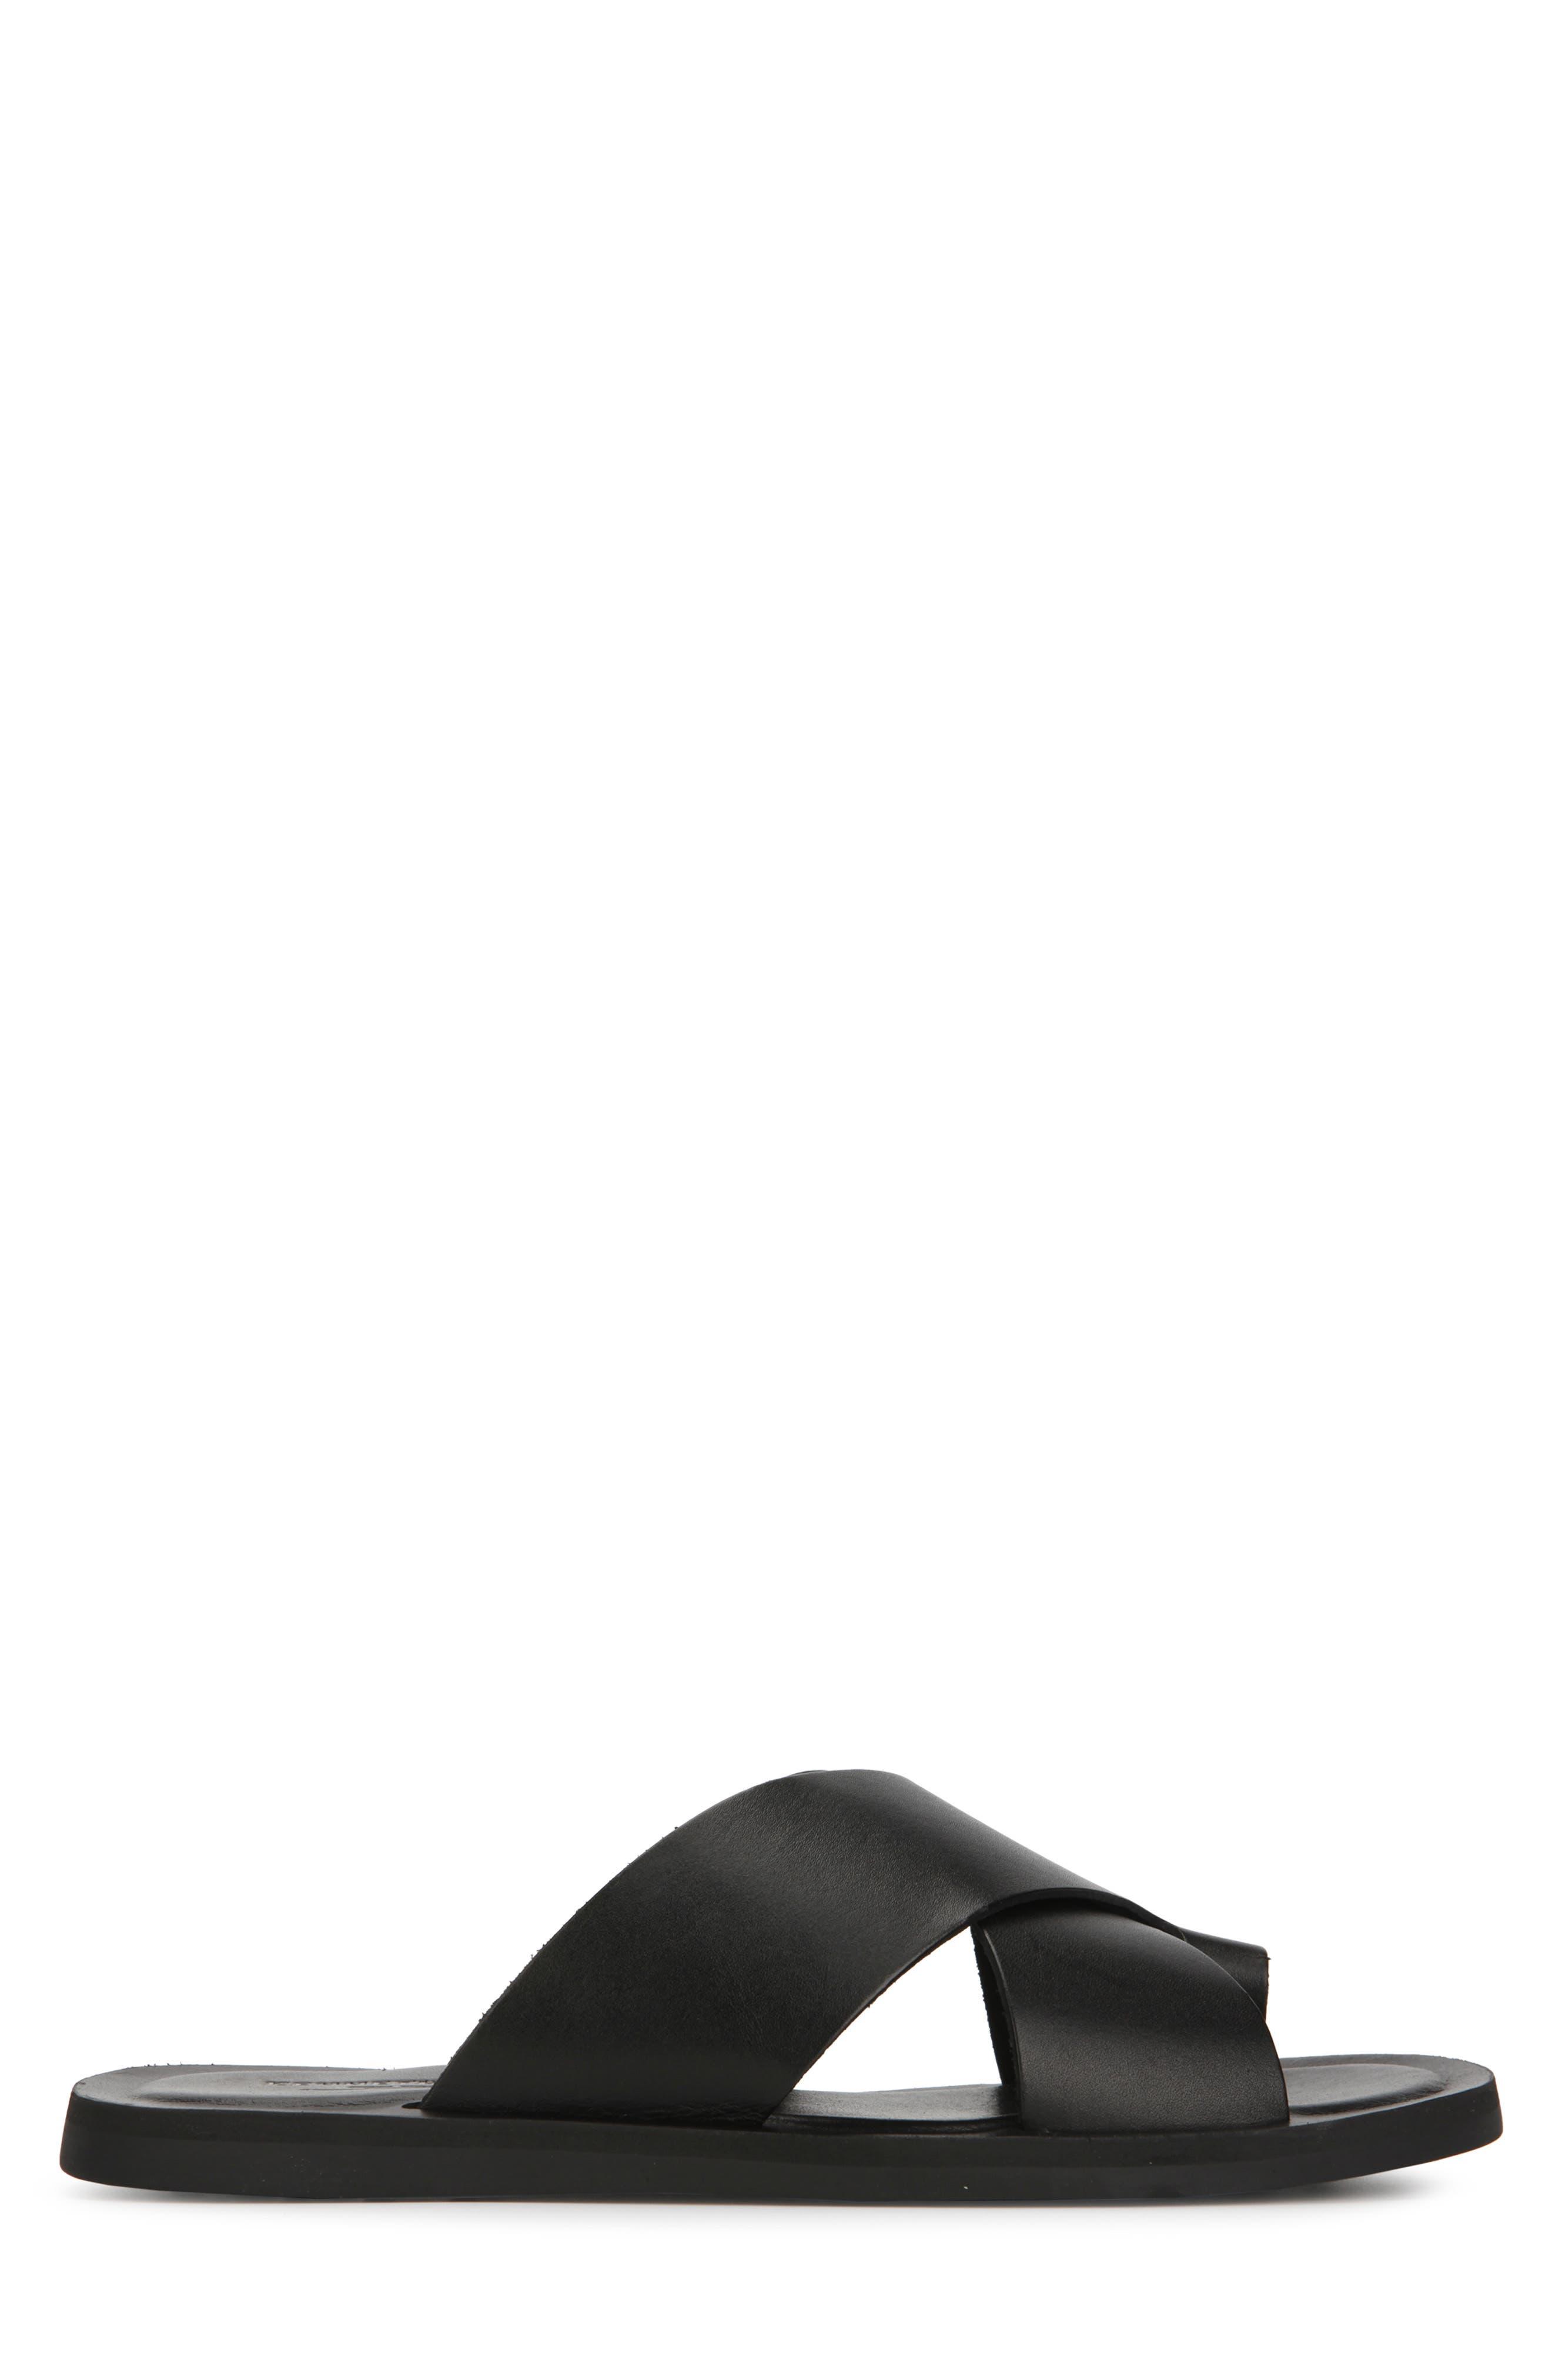 KENNETH COLE NEW YORK, Ideal Slide Sandal, Alternate thumbnail 2, color, BLACK LEATHER